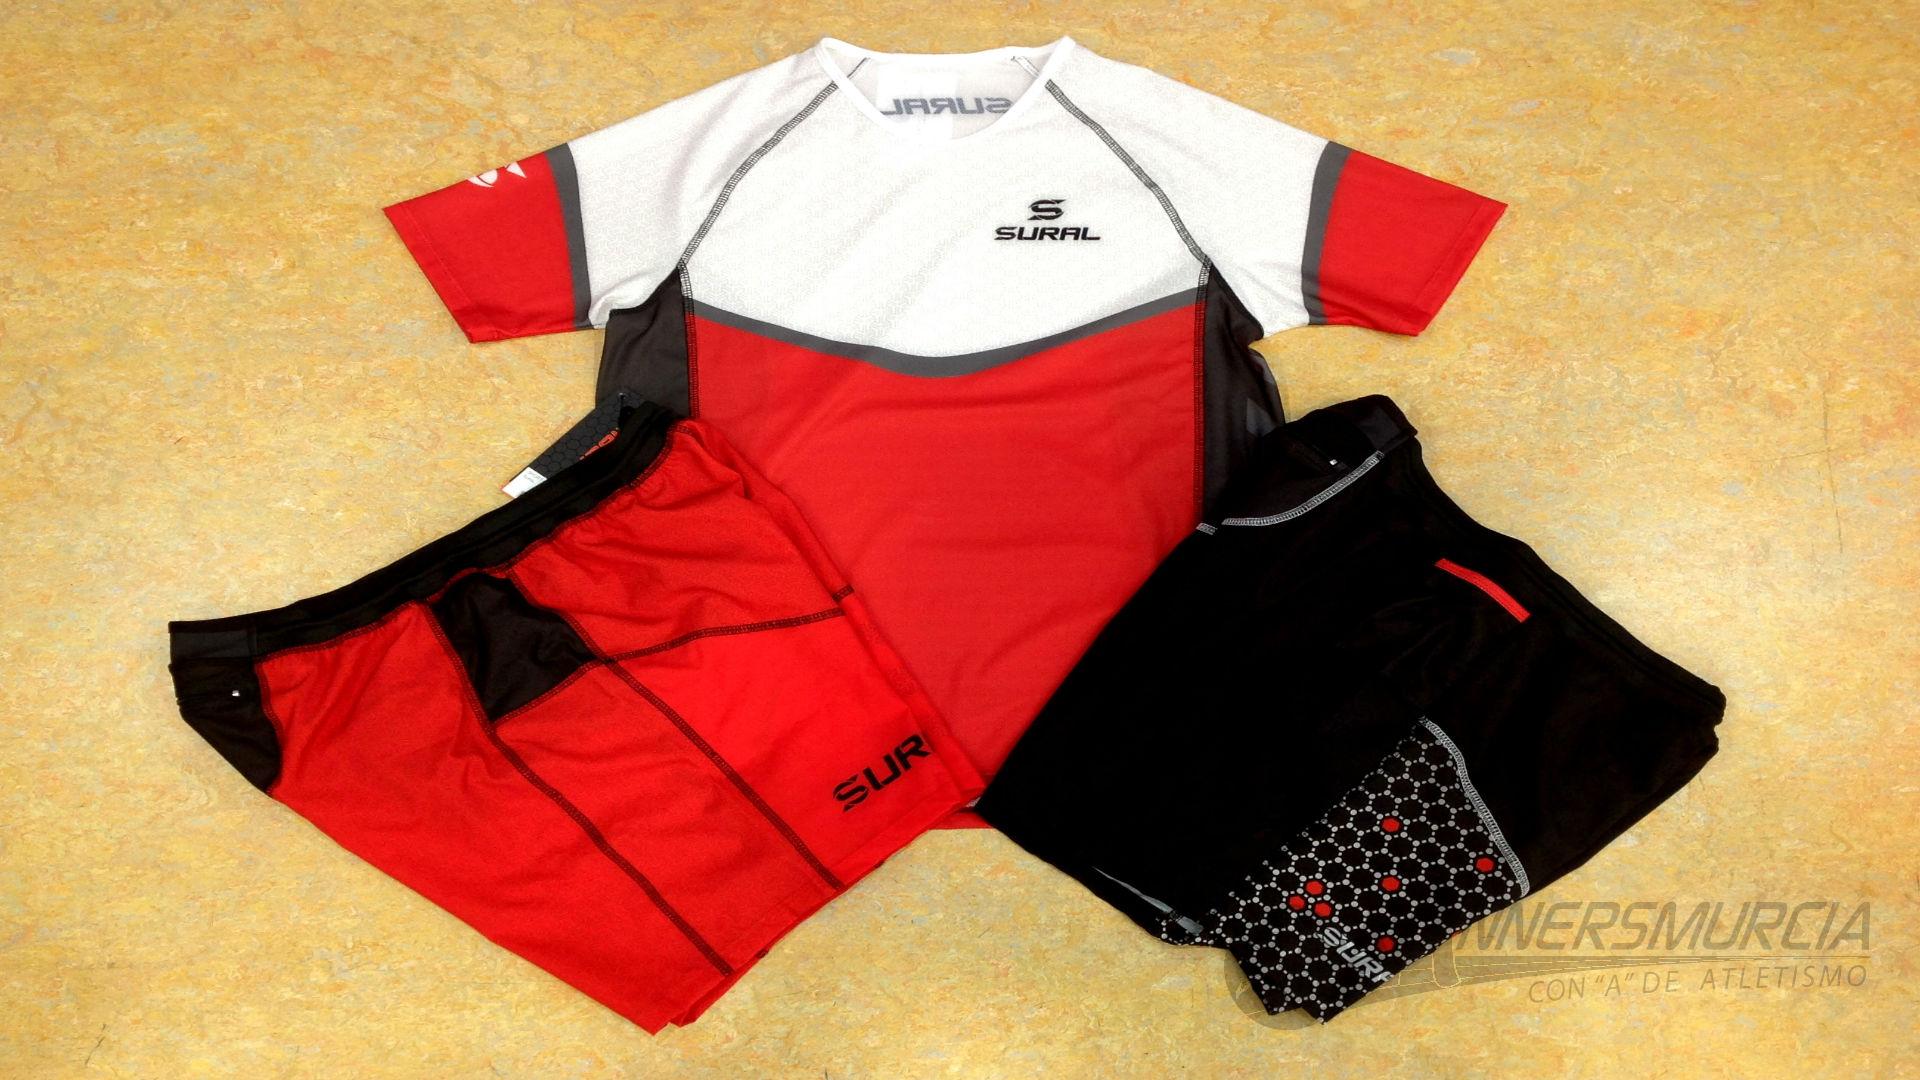 textil-sural-pantalon-camiseta-mc-hombre-rojo-negro-oct-17